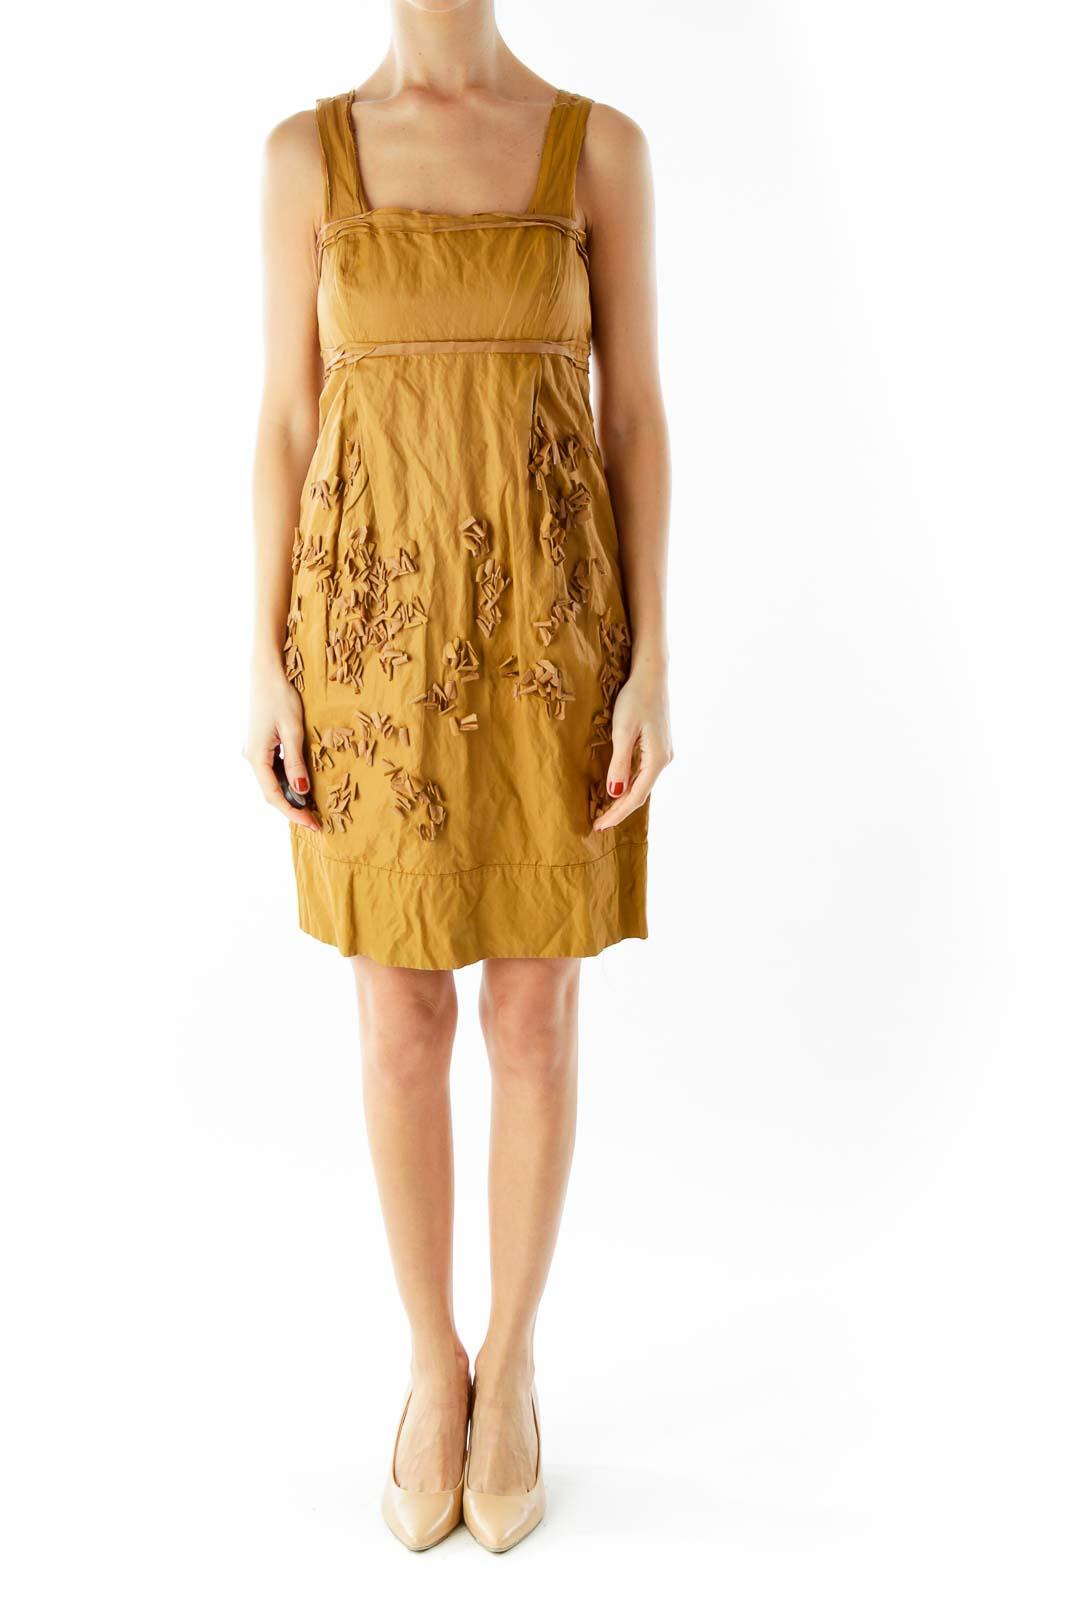 Brown Textured Day Dress